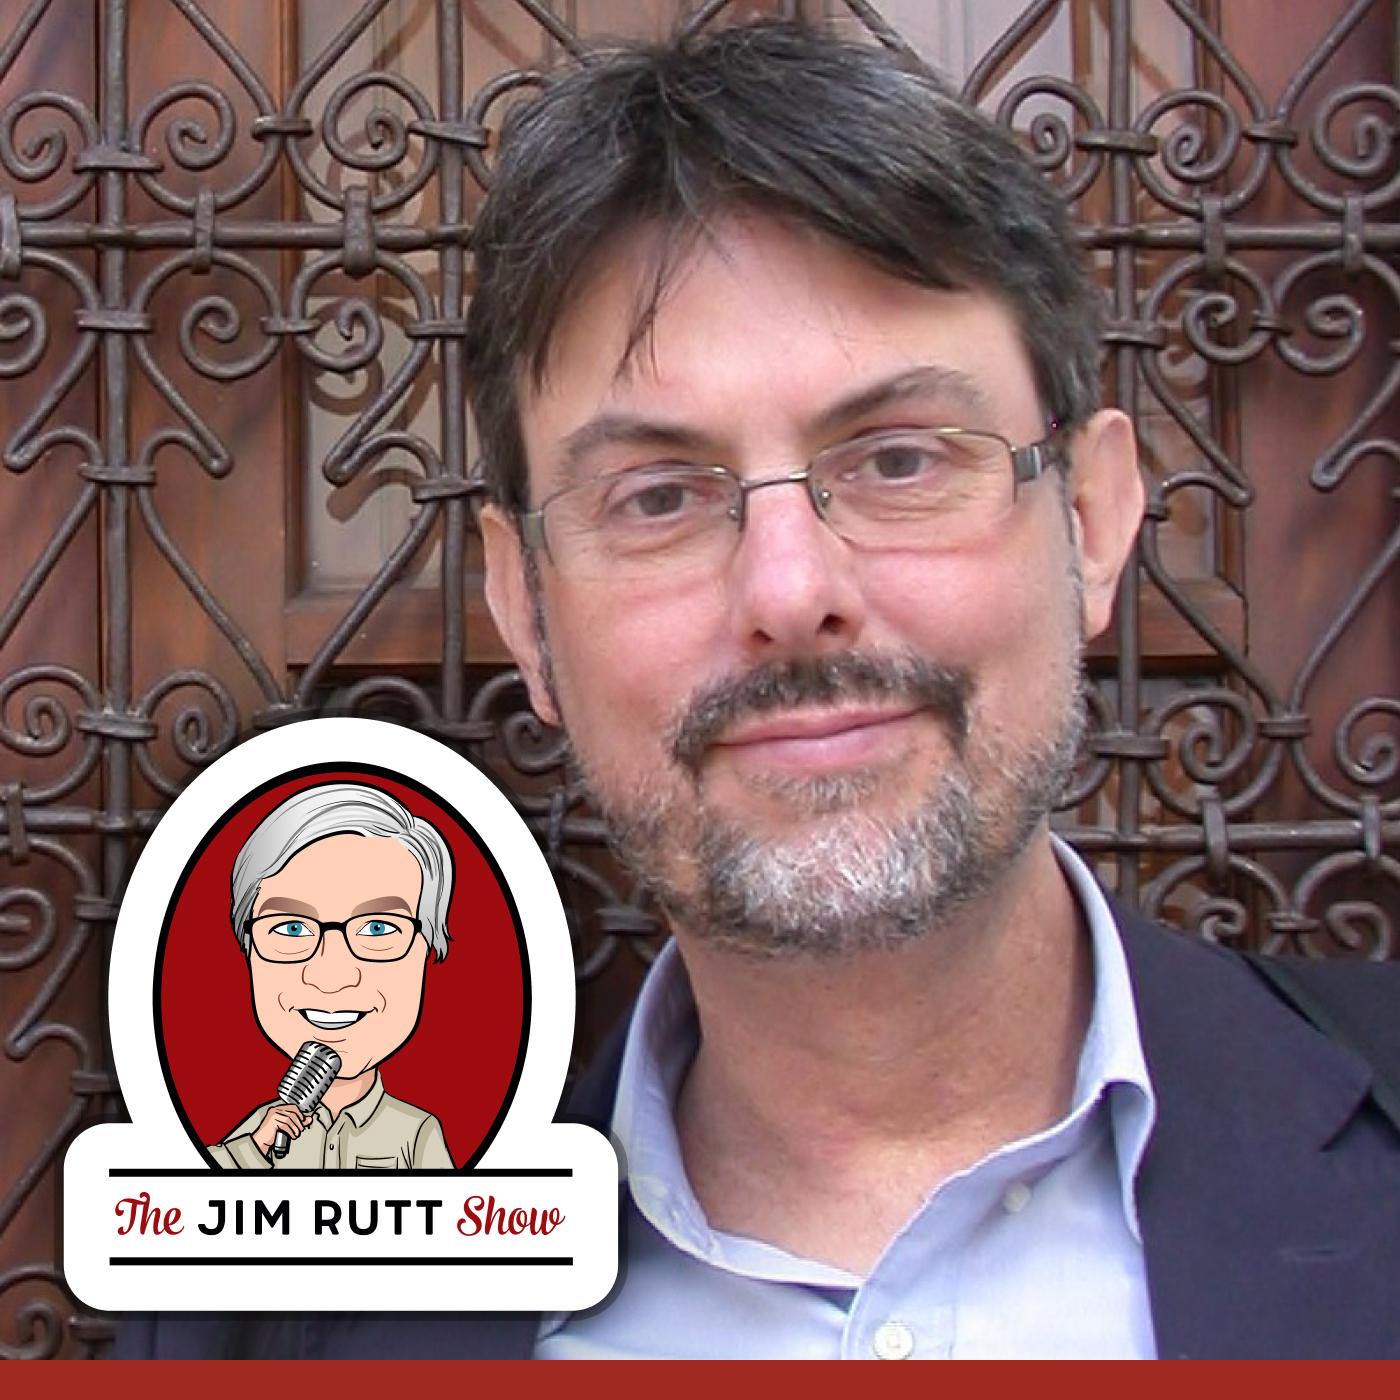 The Jim Rutt Show